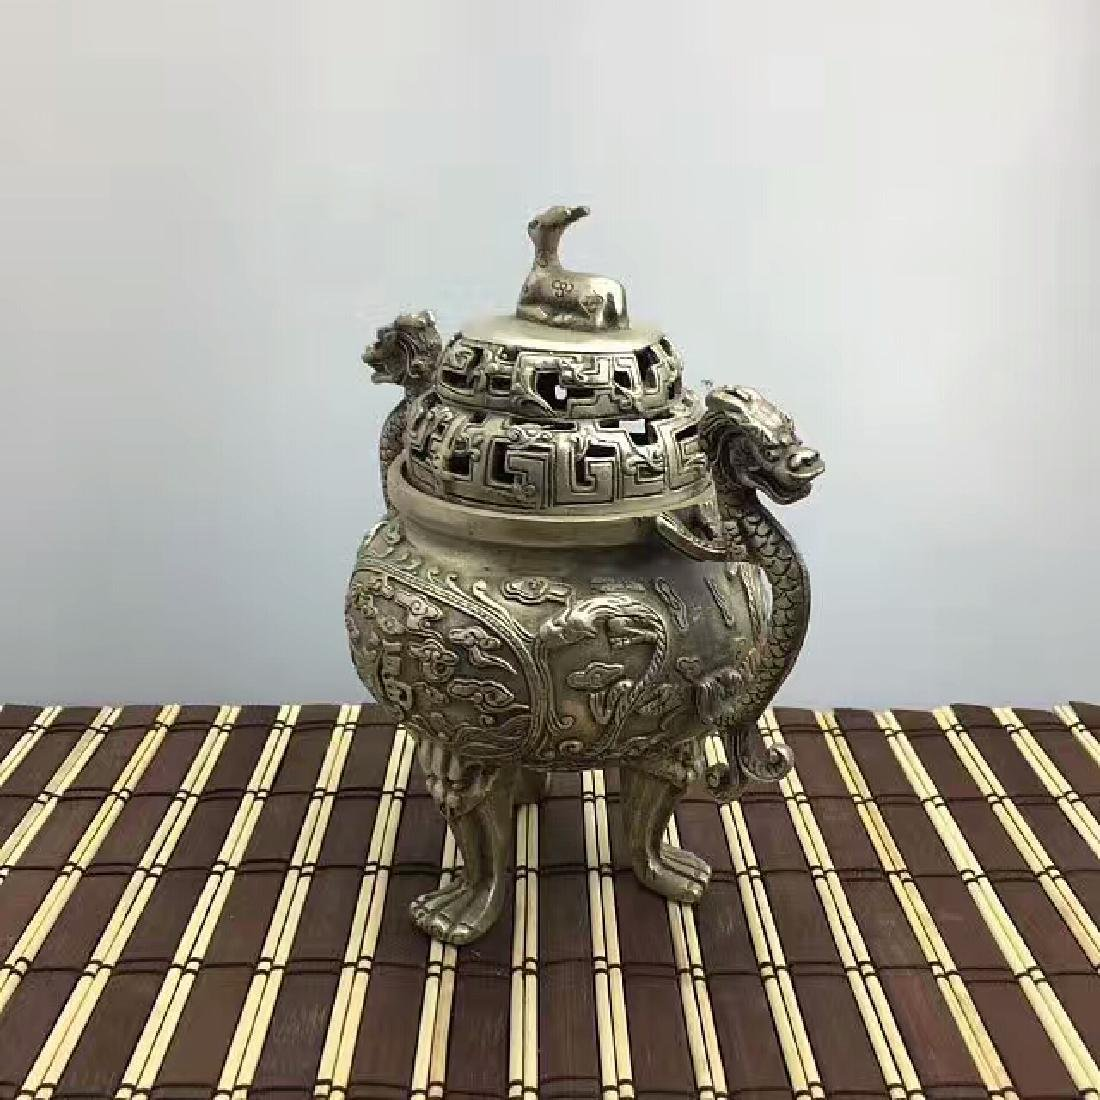 Chinese Antique Copper-Nickel Incense Burner